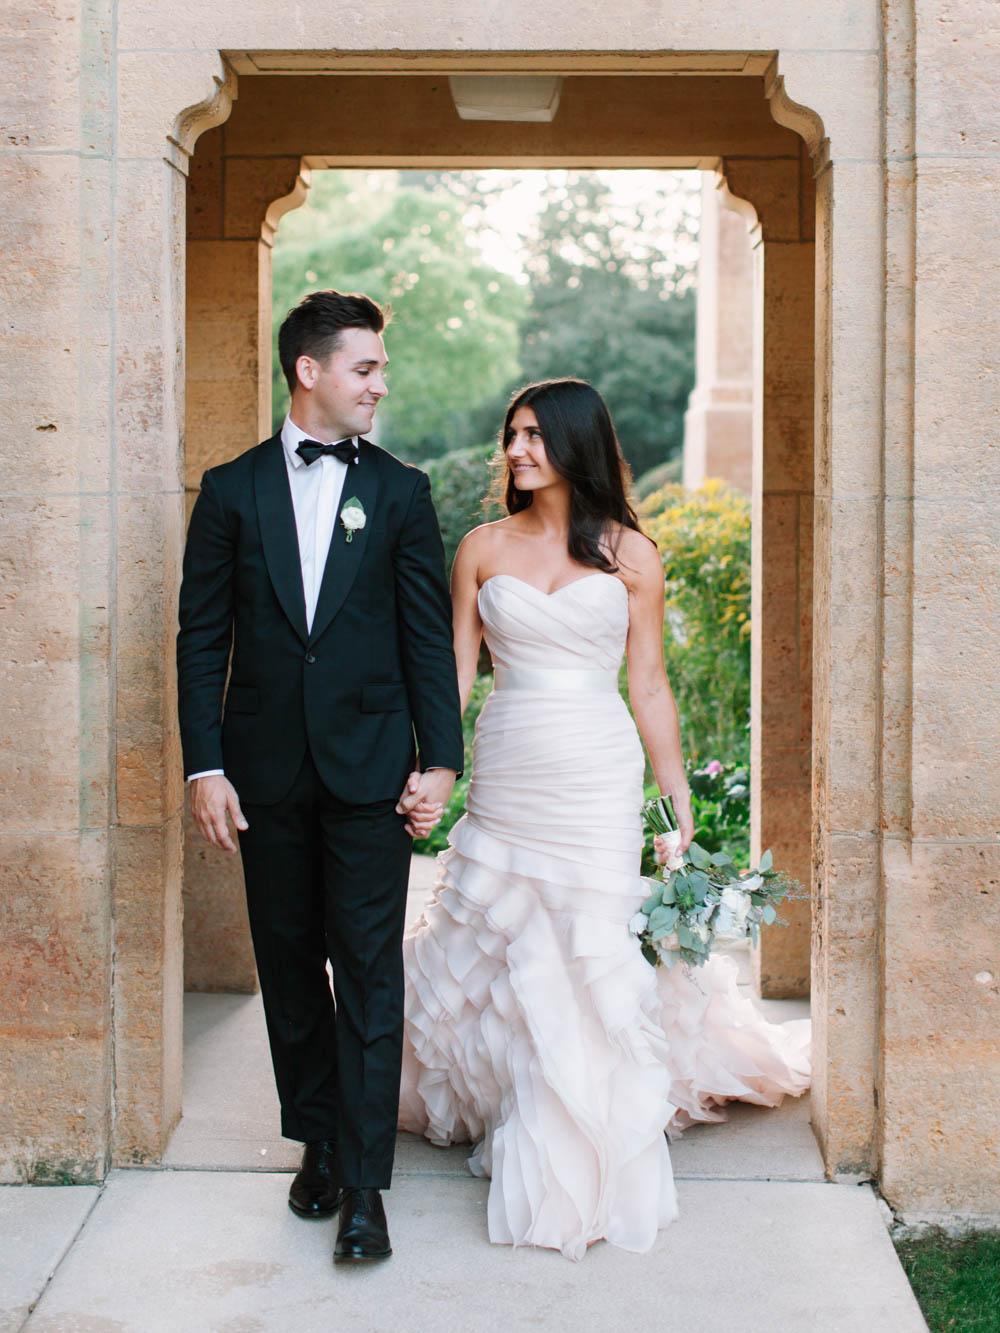 kateweinsteinphoto_margaretandrew_wedding-670.jpg